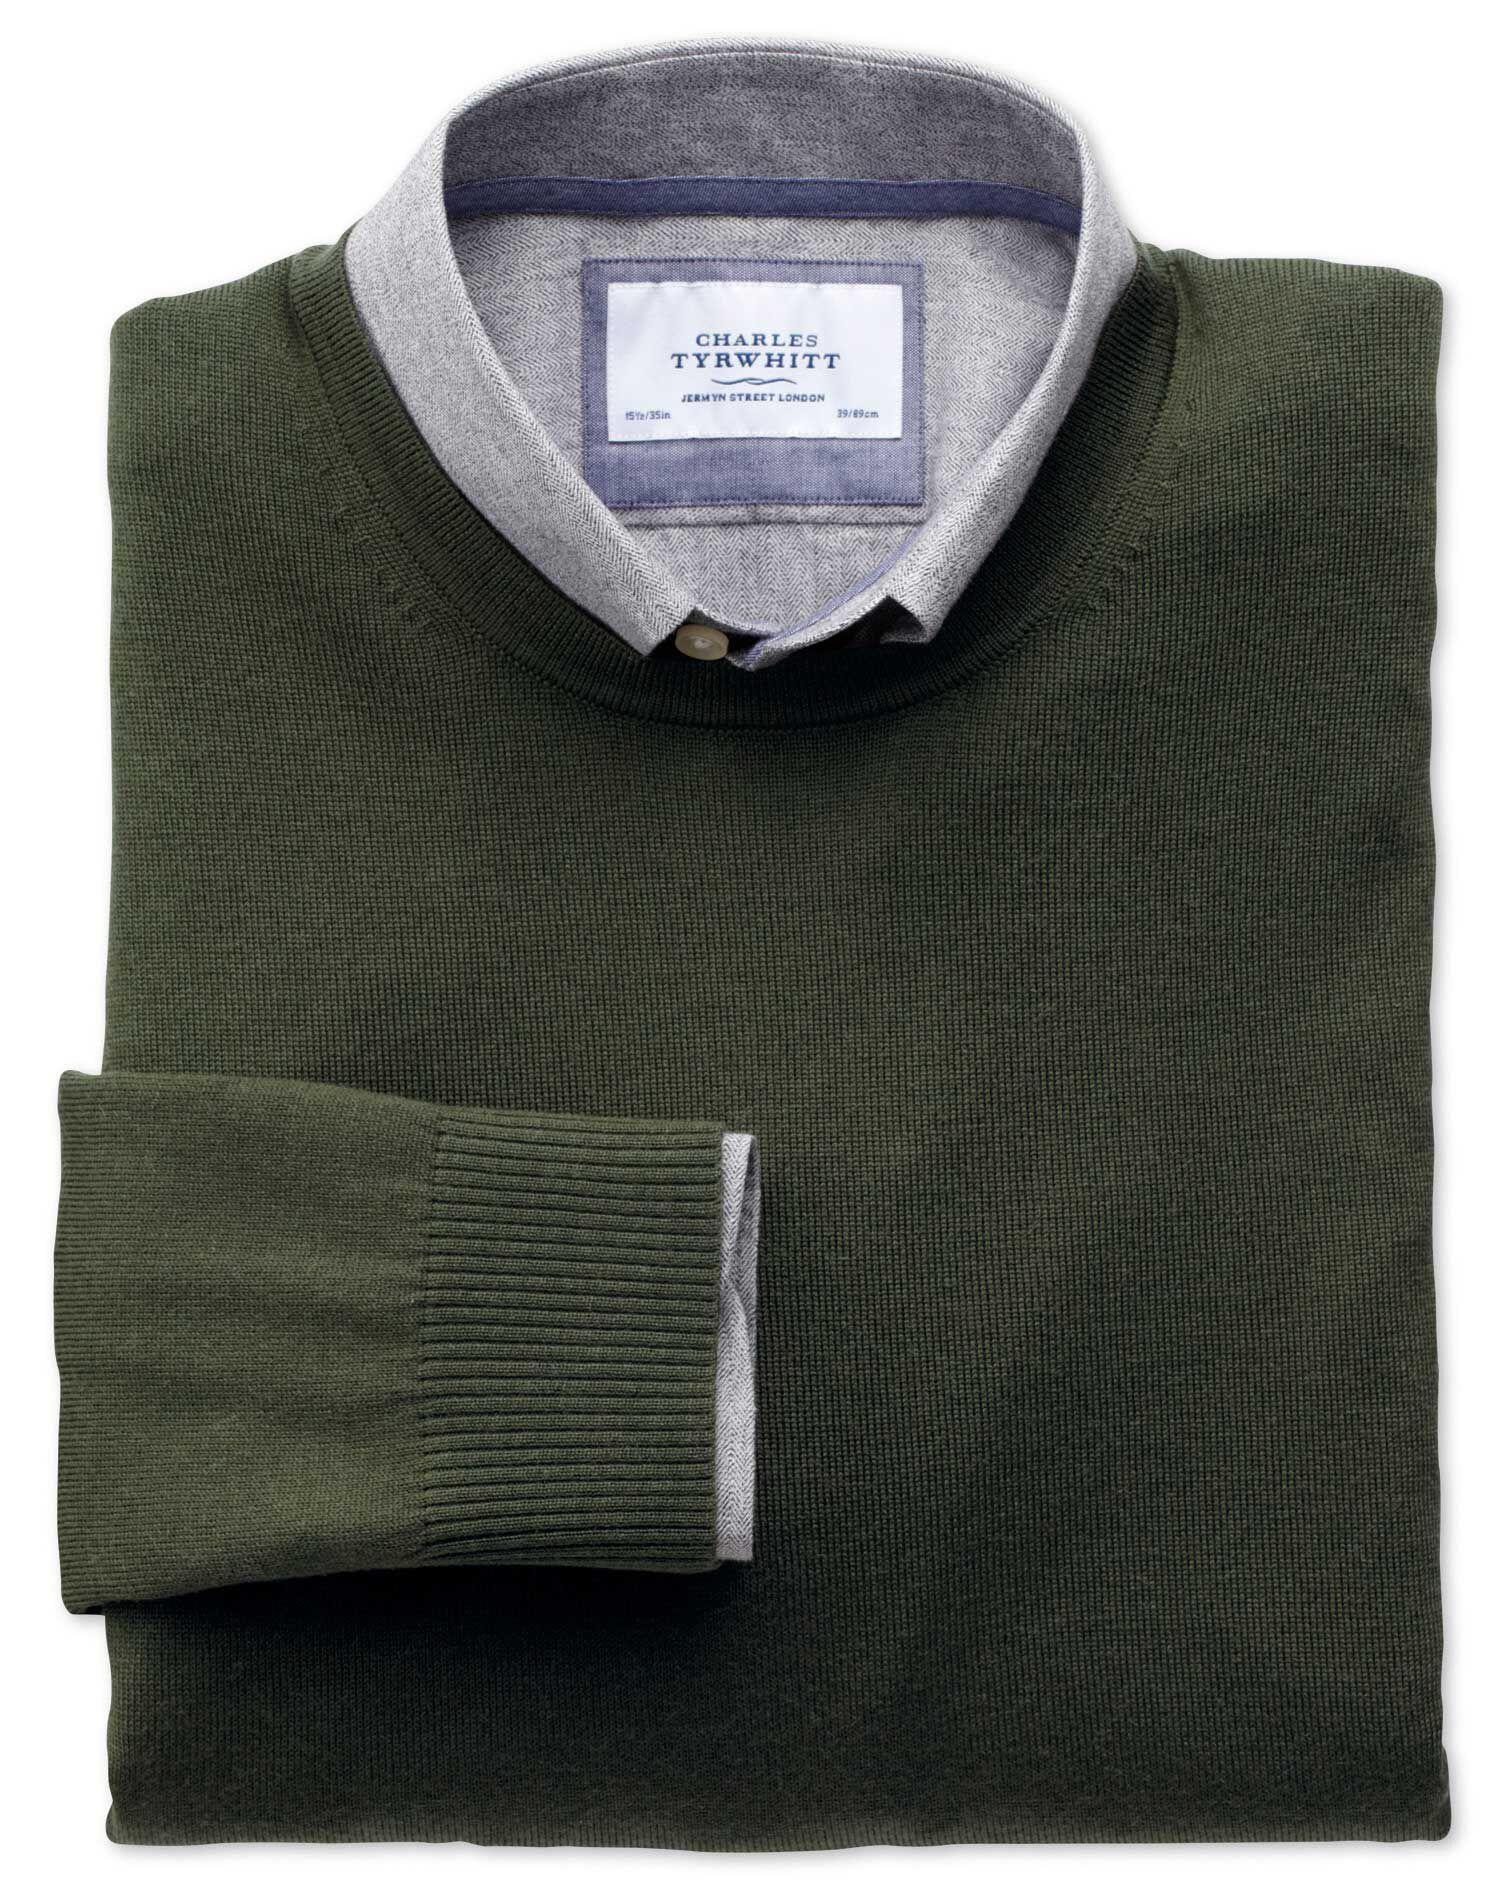 Dark Green Merino Wool Crew Neck Jumper Size Small by Charles Tyrwhitt